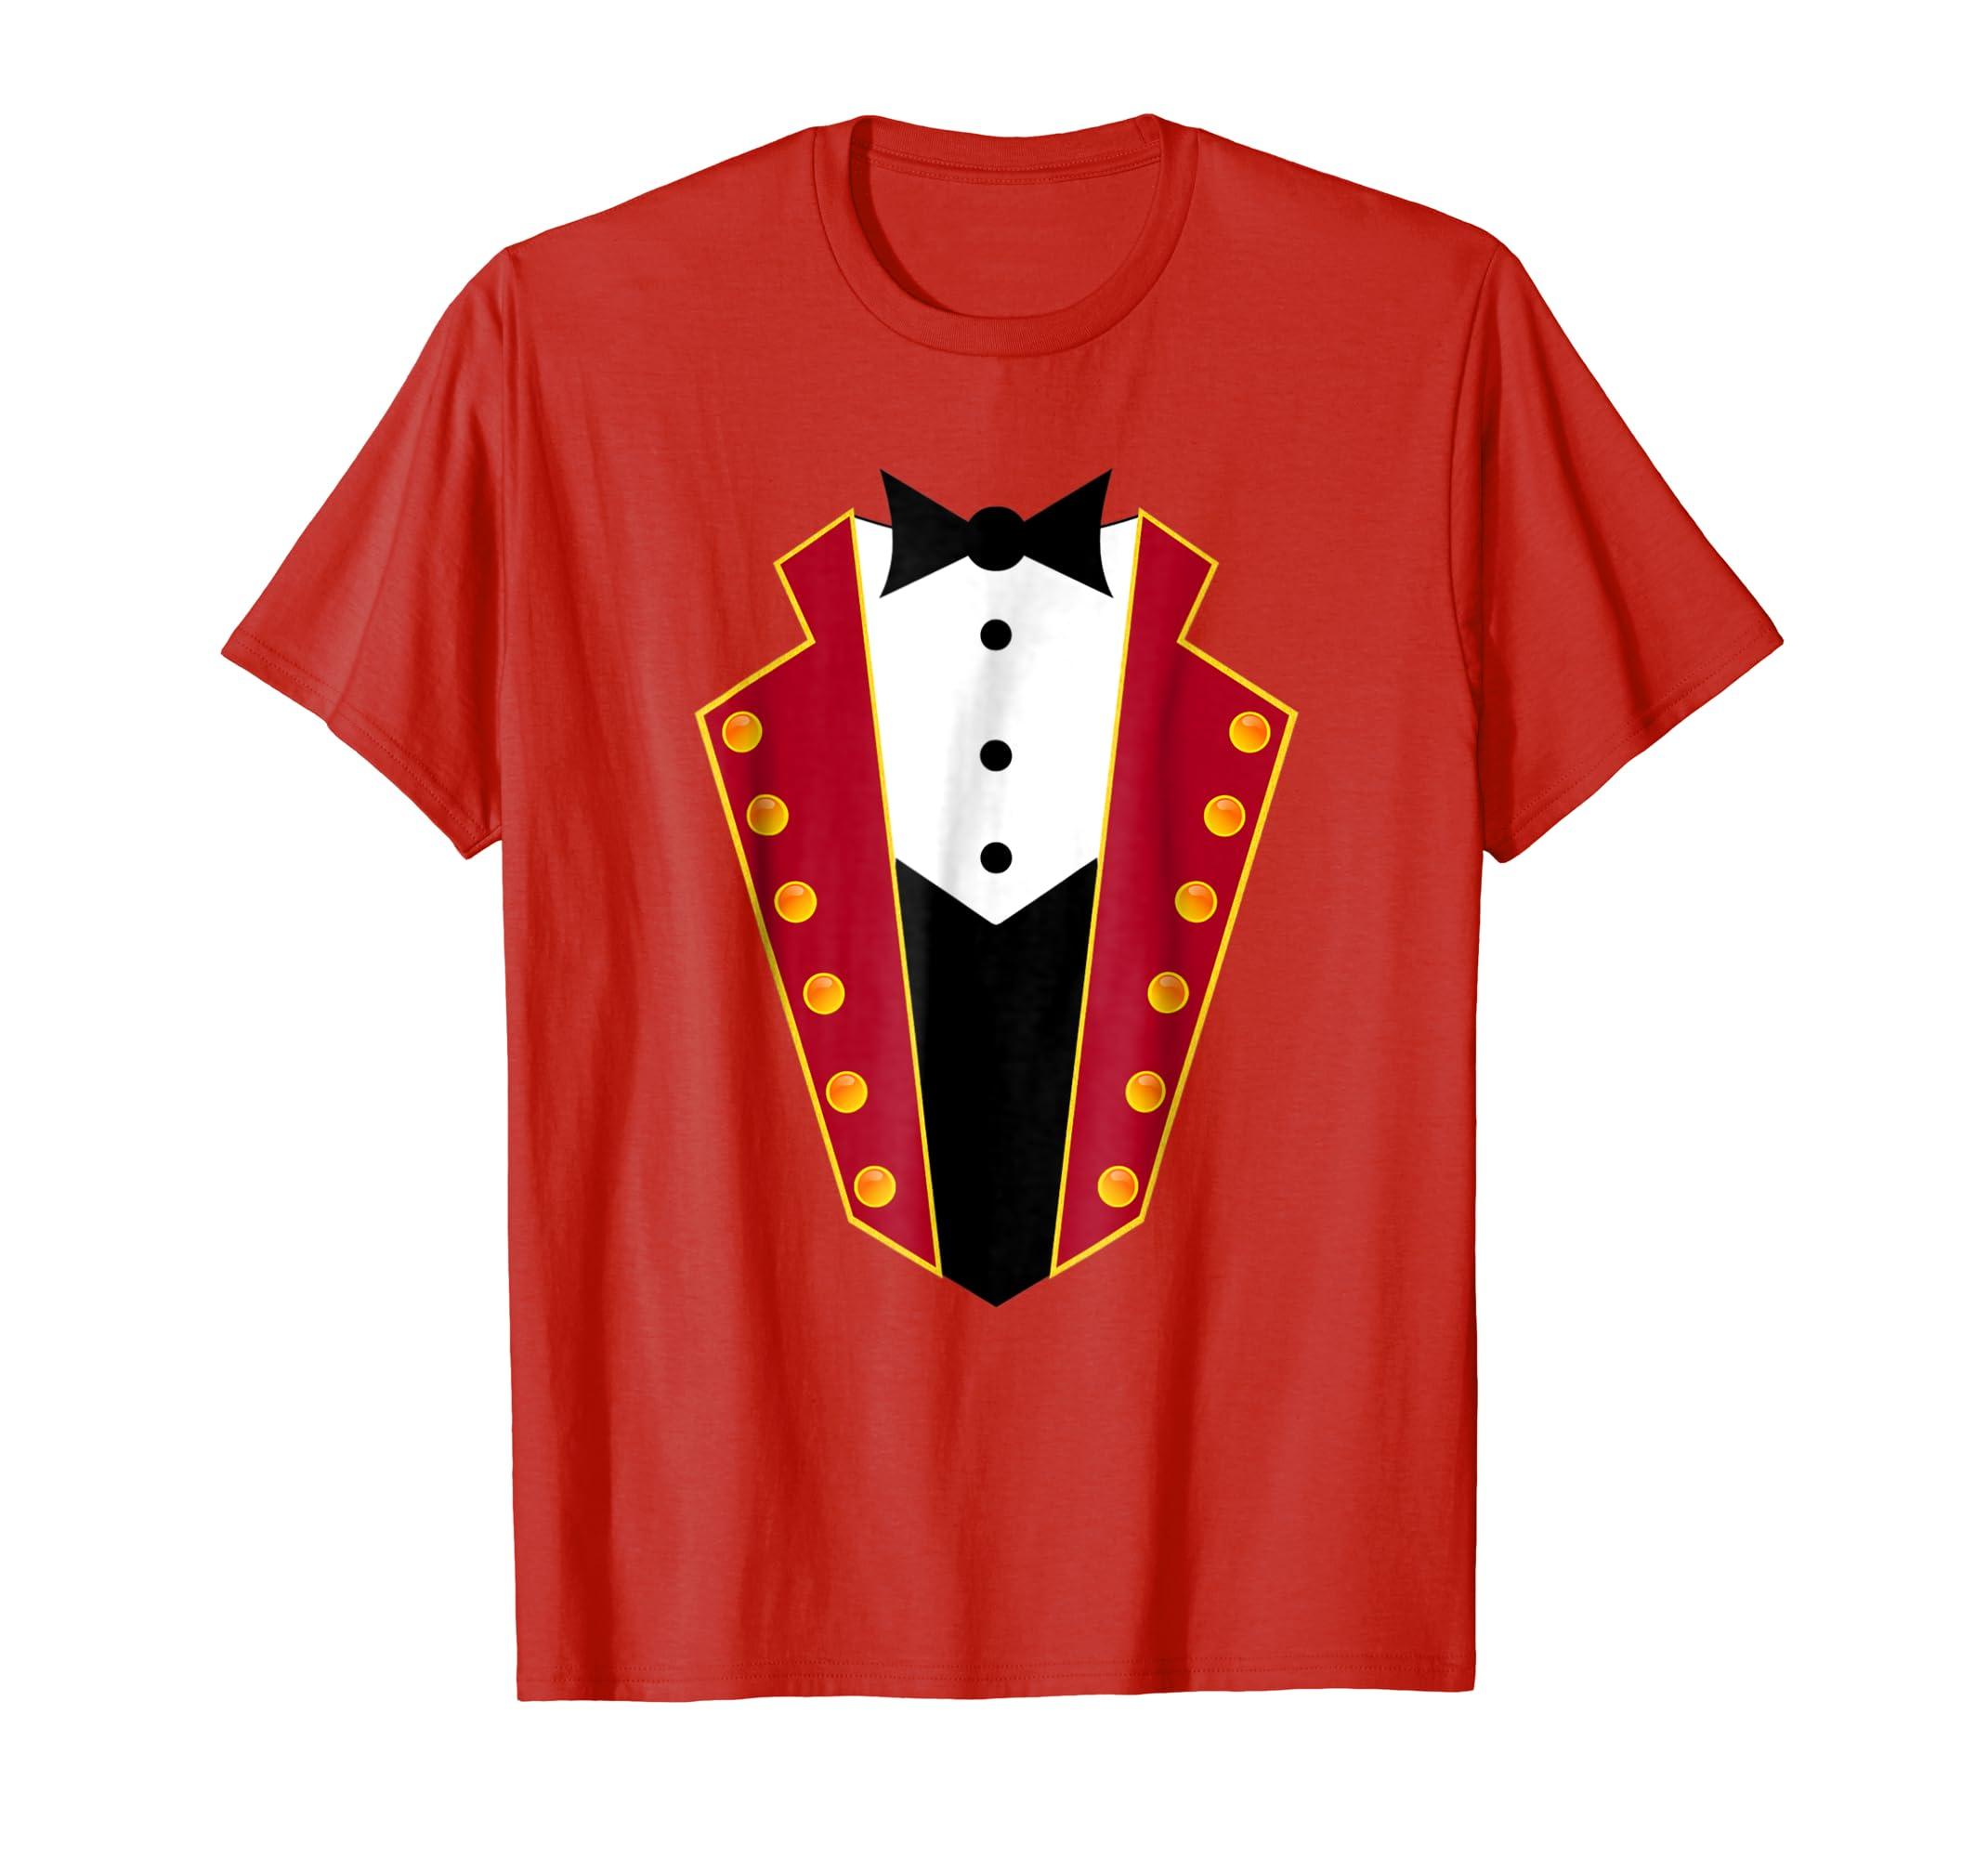 Ringmaster Costume Circus Showman Party Shirt Gift-mt